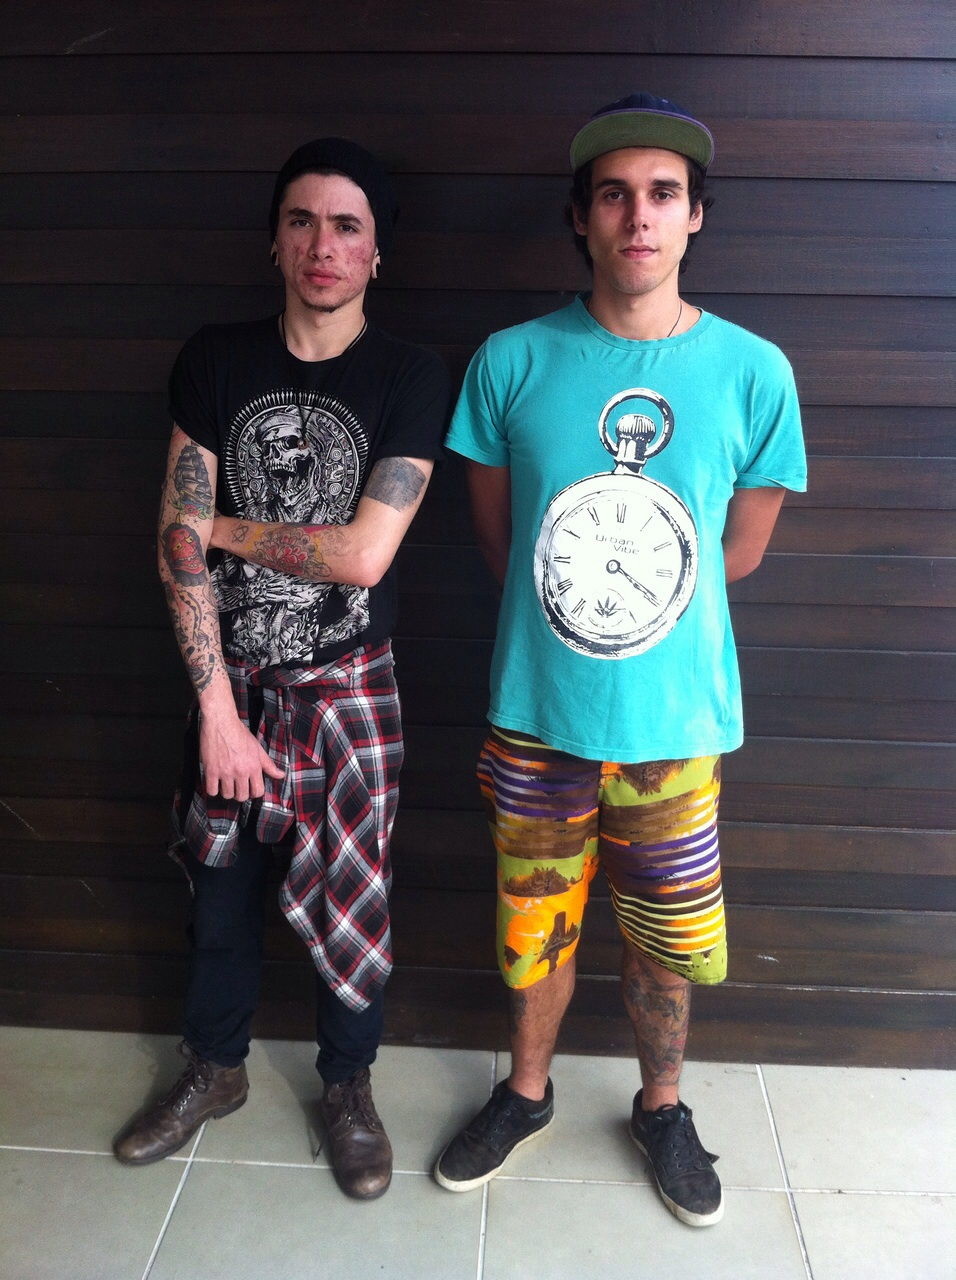 Mateus Wolf tatuador e Ernani William visitante